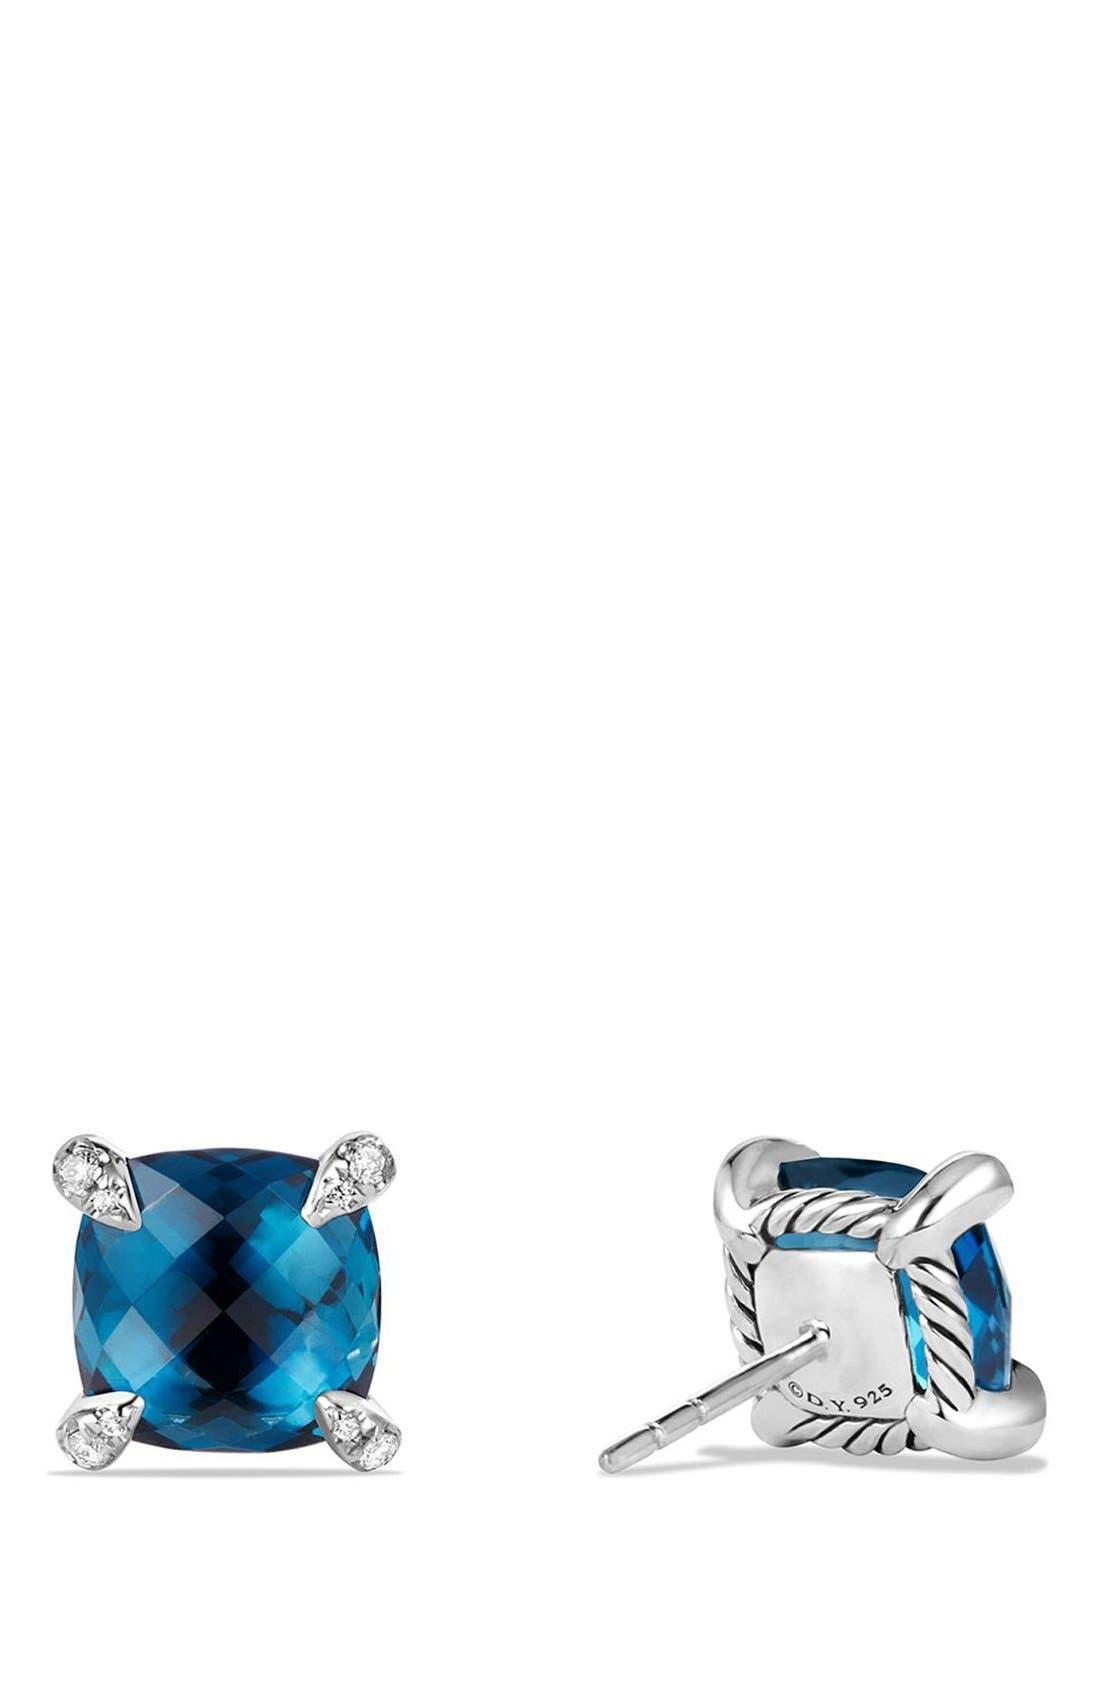 'Châtelaine' Earrings with Semiprecious Stones and Diamonds,                             Alternate thumbnail 2, color,                             Silver/ Hampton Blue Topaz